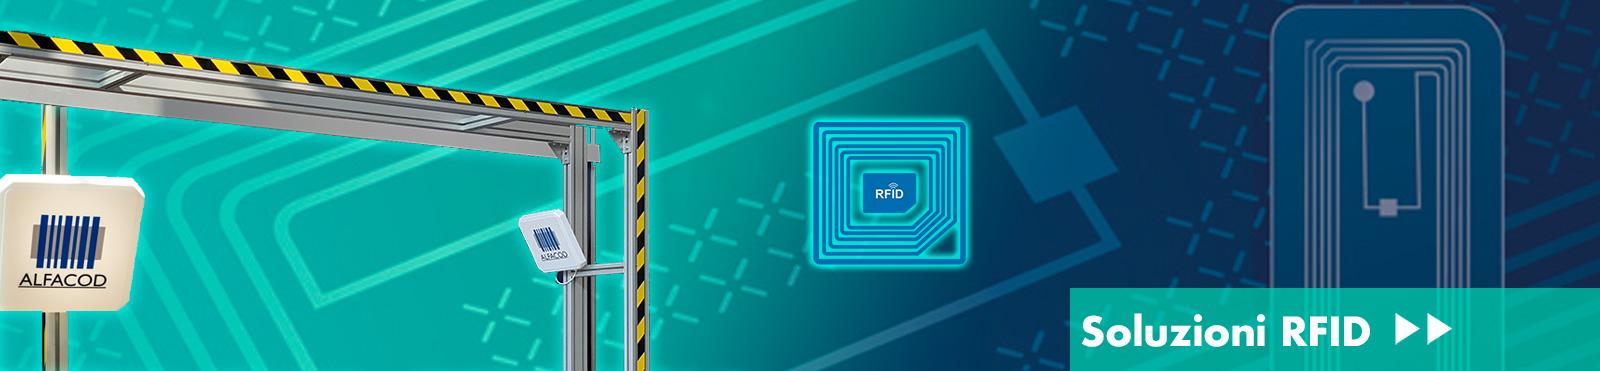 alfacod-soluzioni-rfid